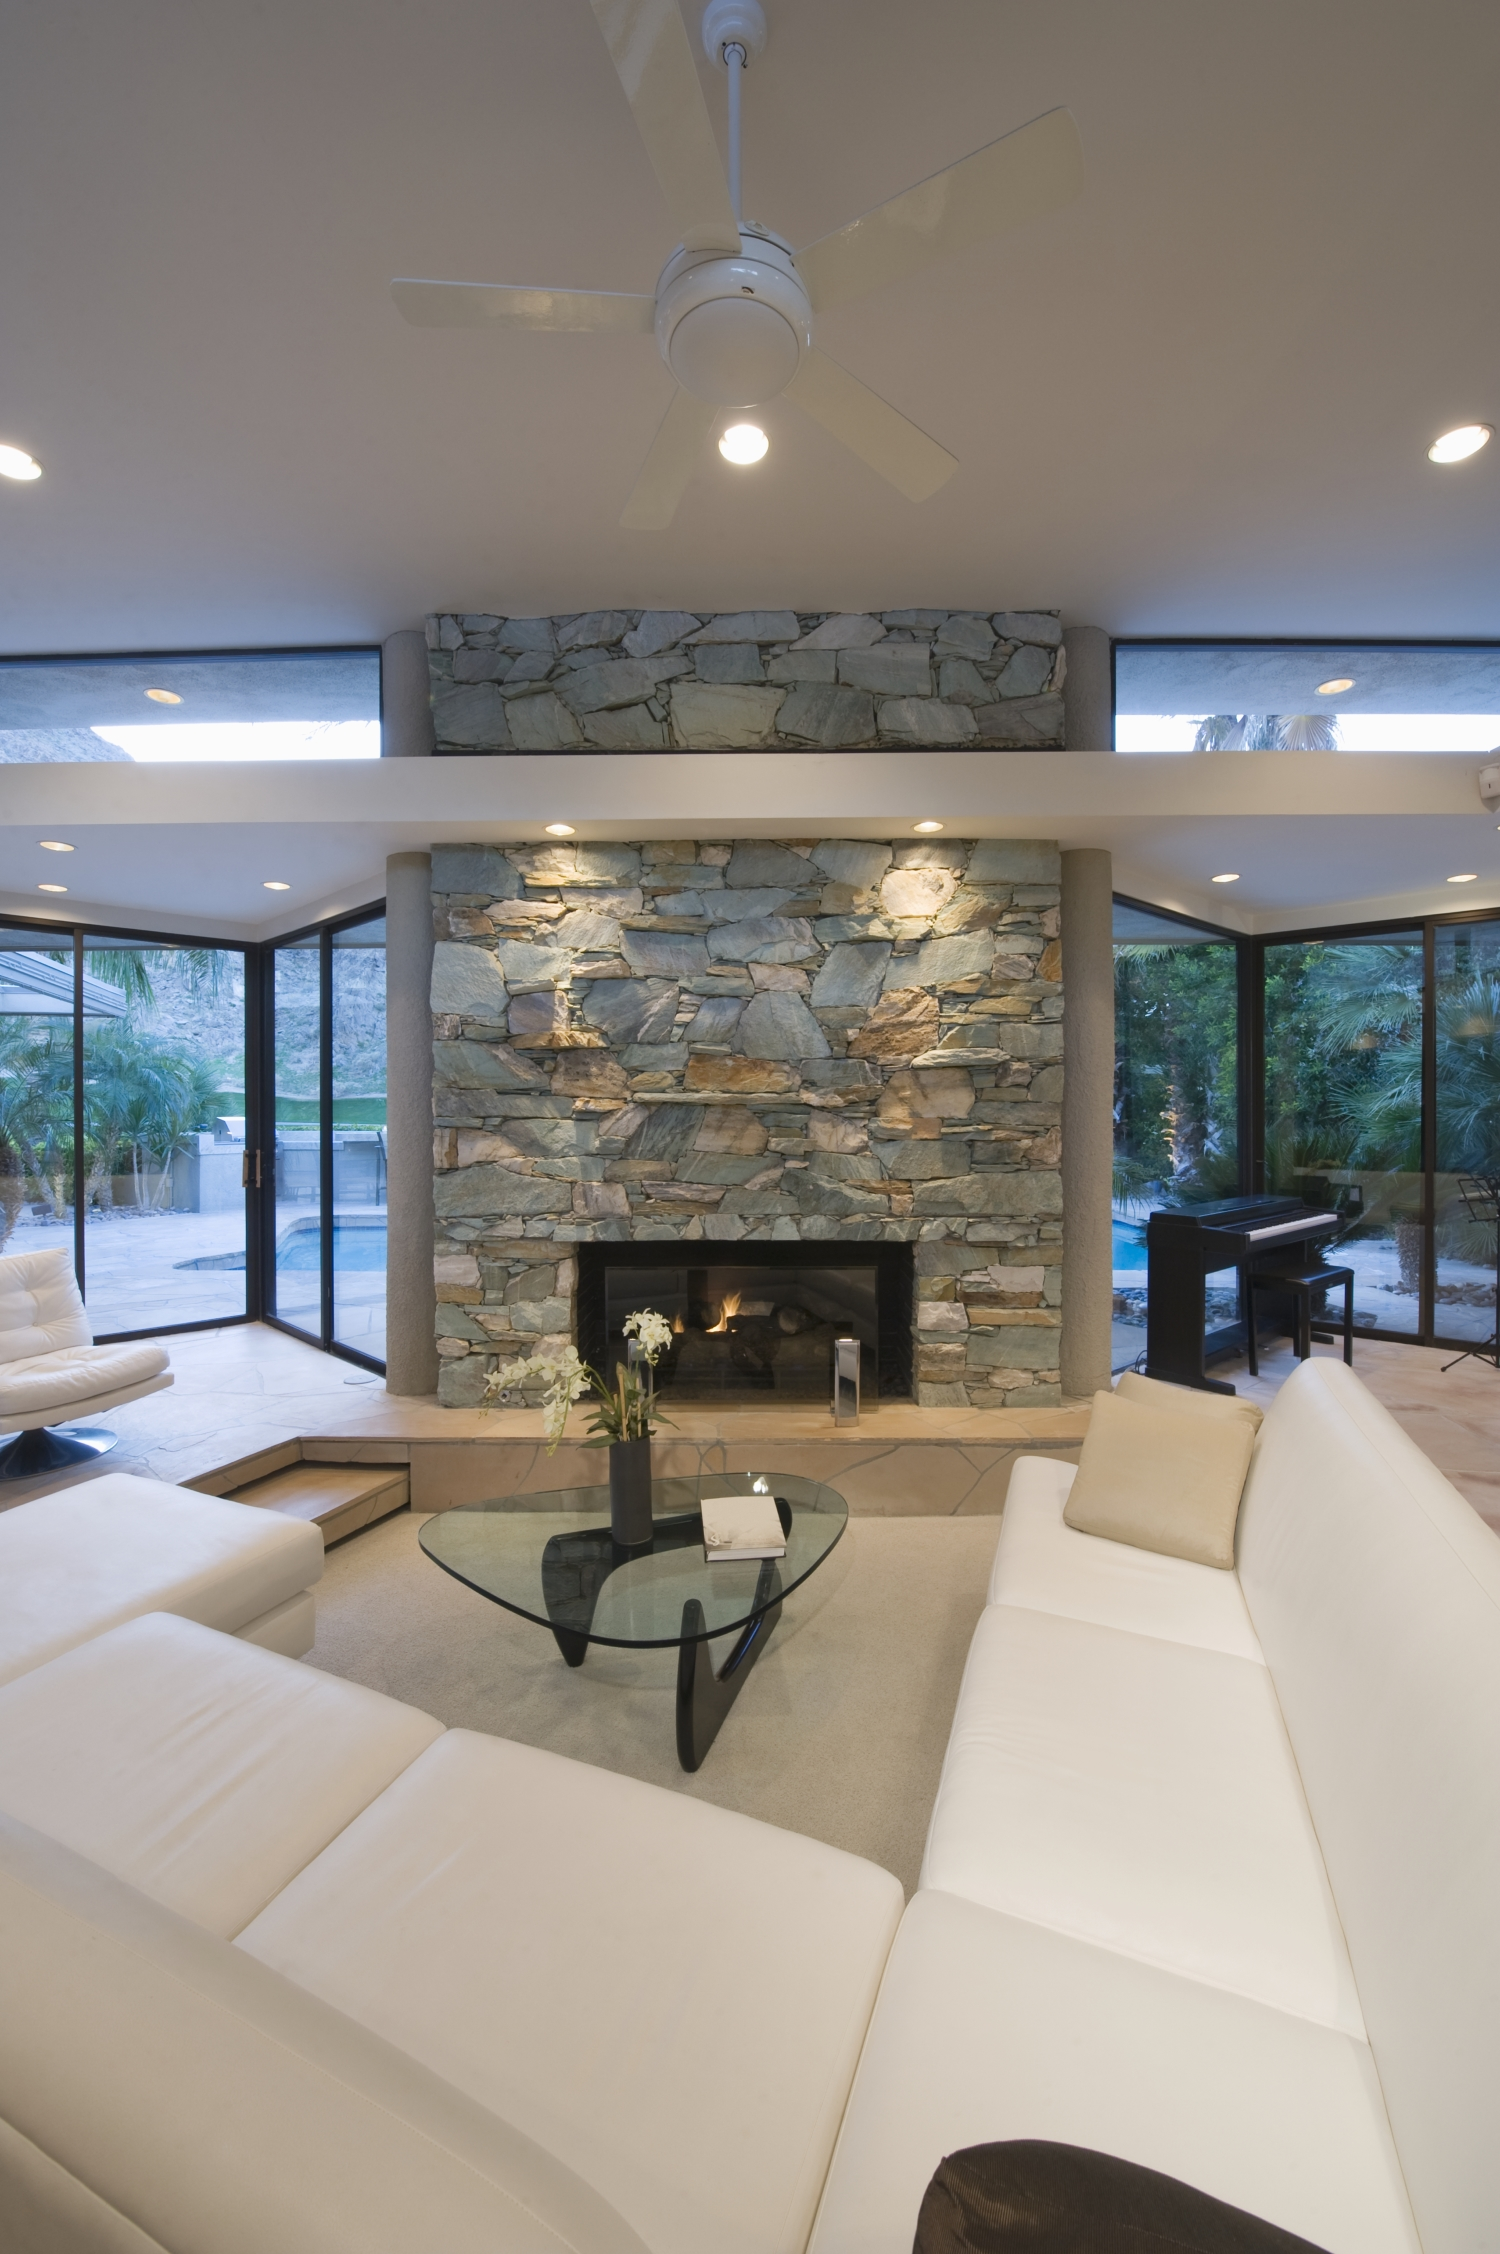 razzeo-design-client-hangout-room-sofas-fireplace.jpg